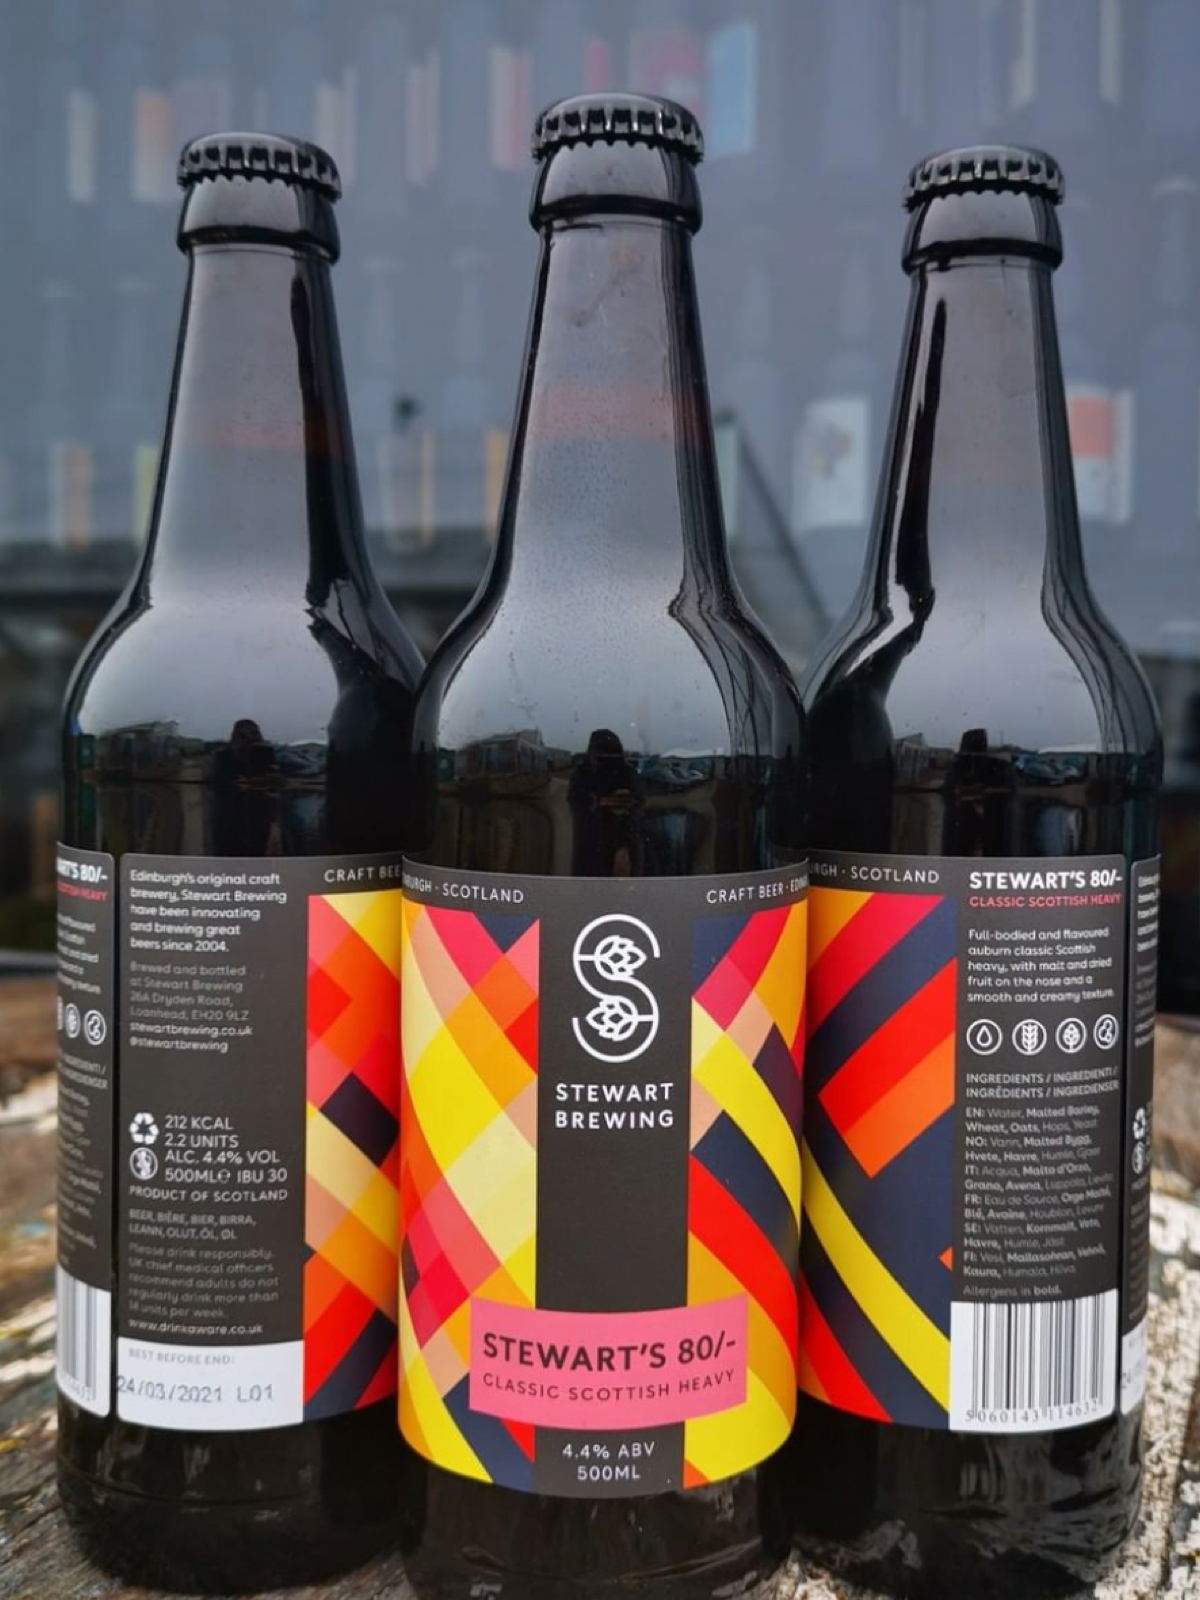 Three beer bottles from Stewart Brewing